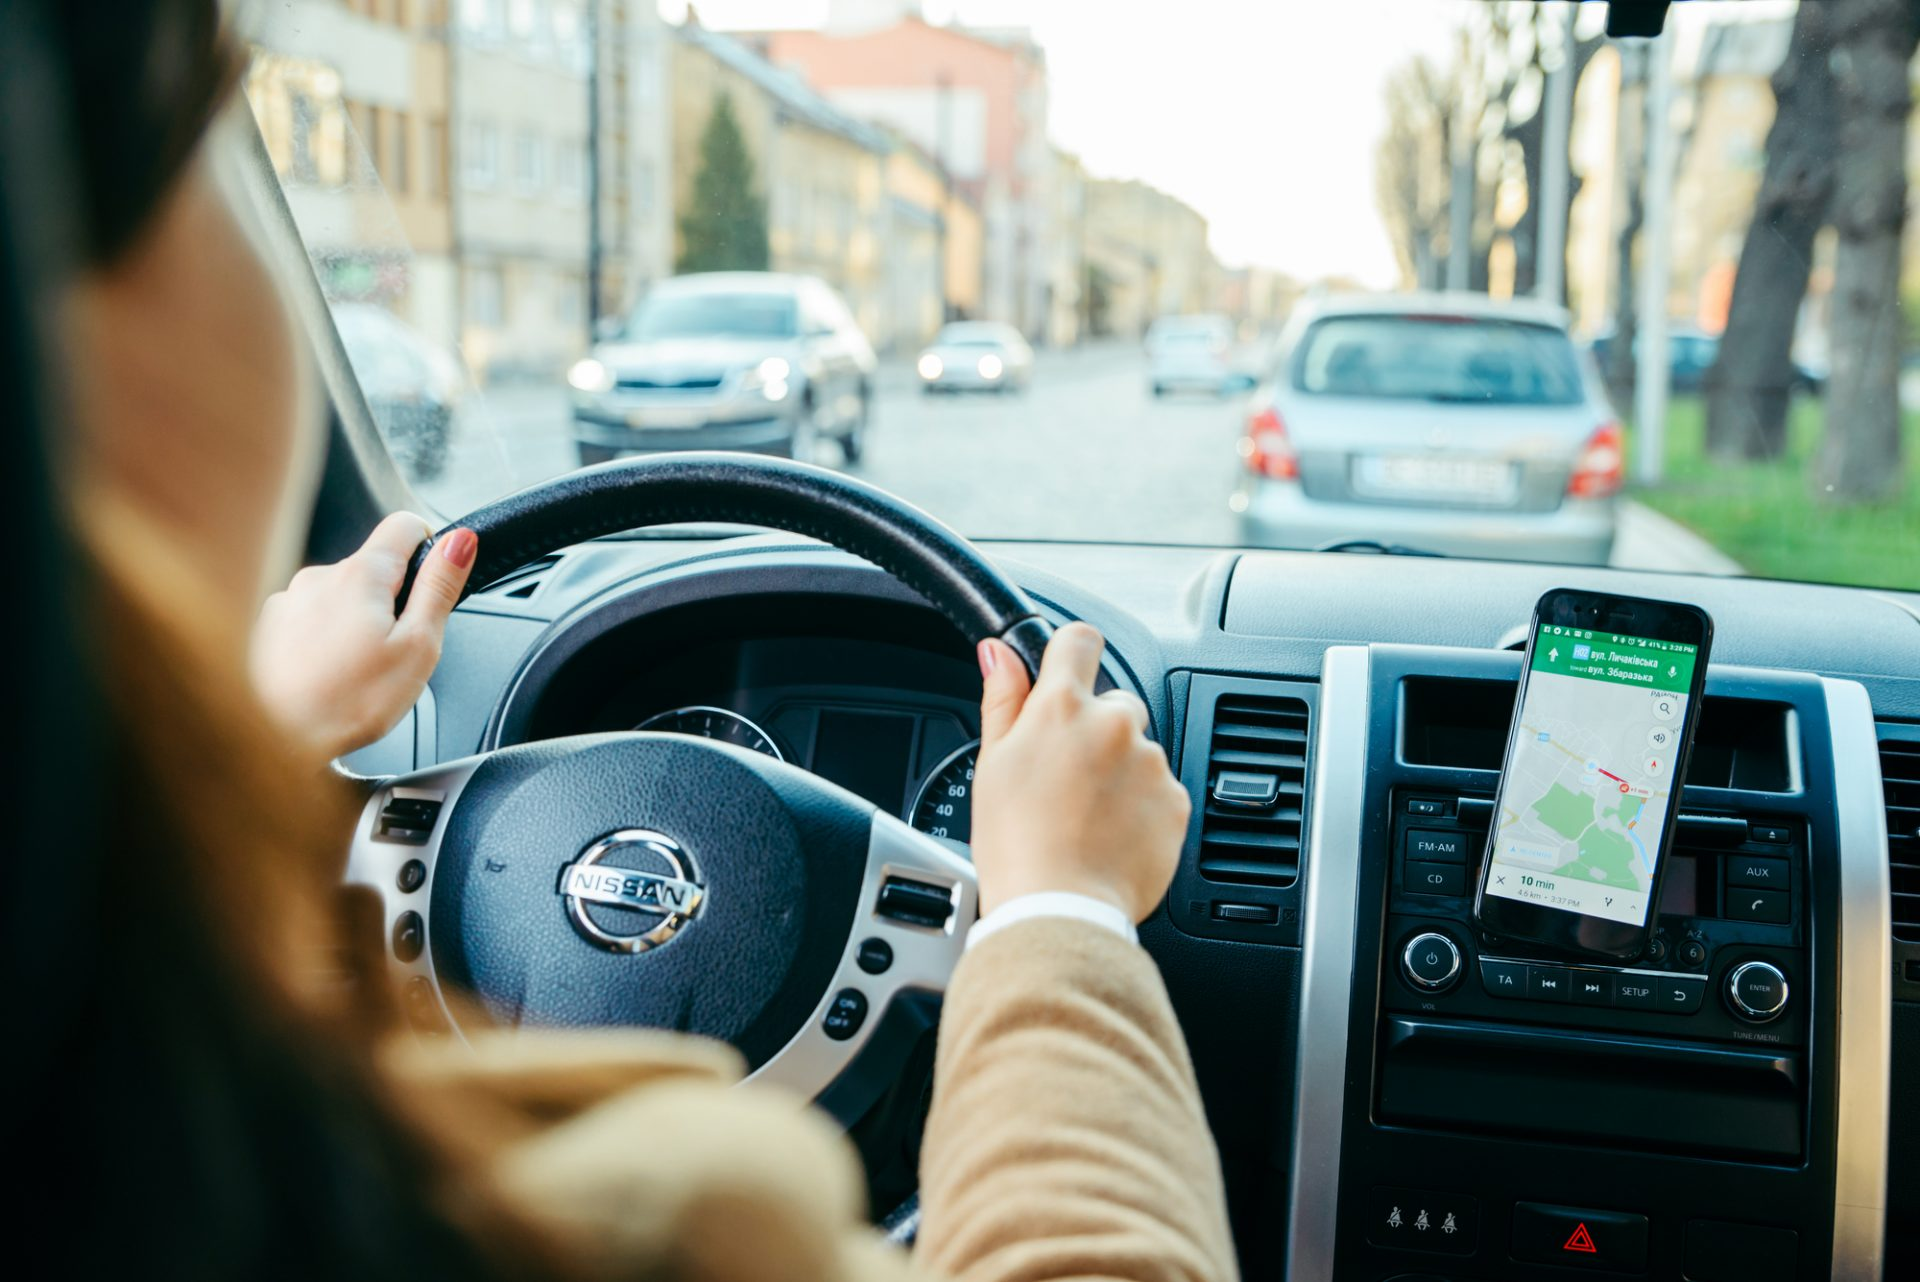 Best Car Phone Mount 2021 | Popsockets VS Spigen VS MPOW